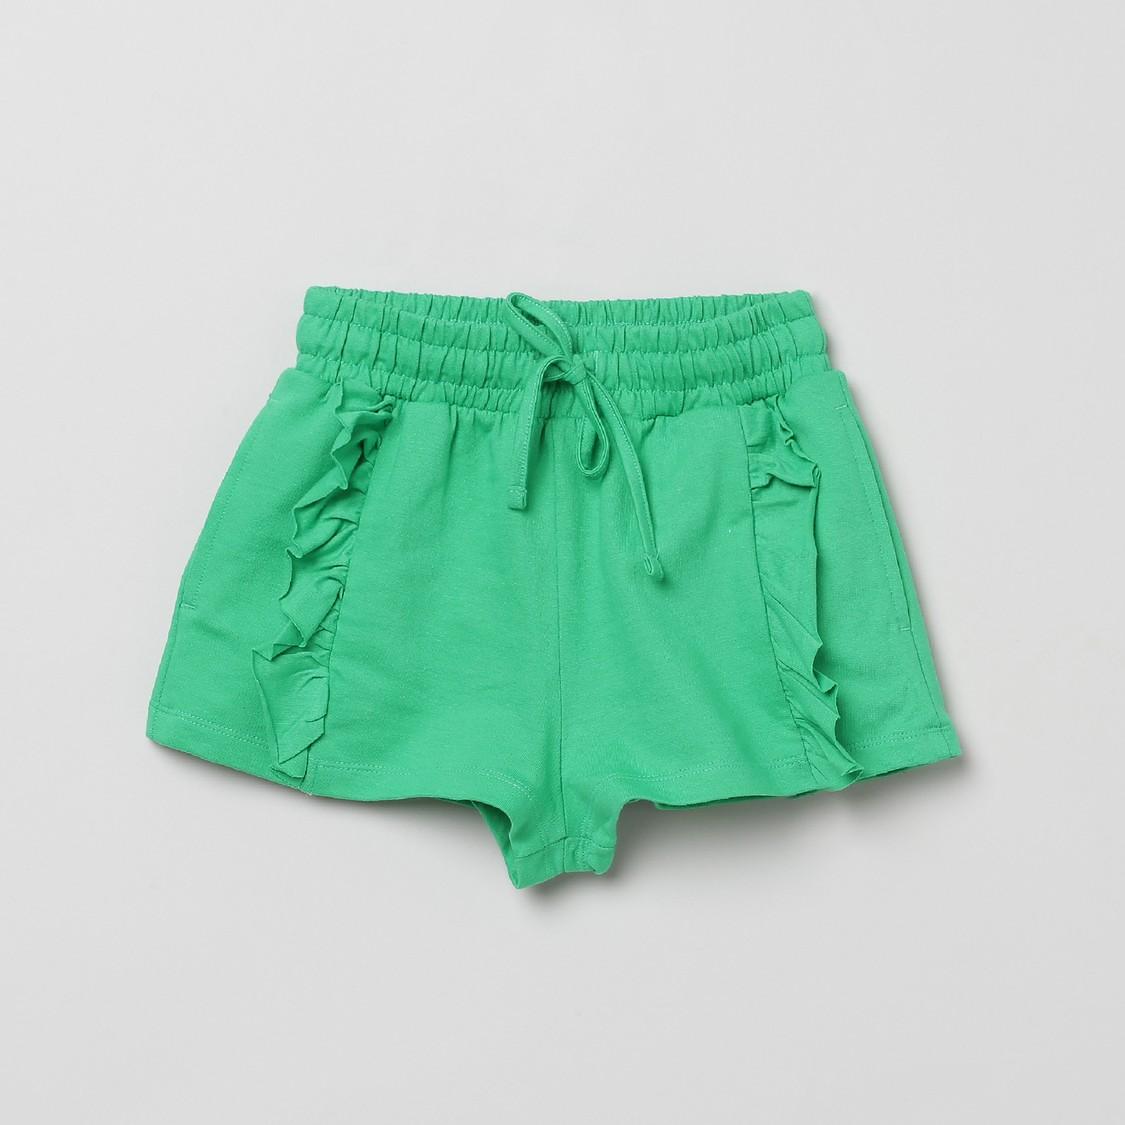 MAX Solid Knit Elasticated Shorts